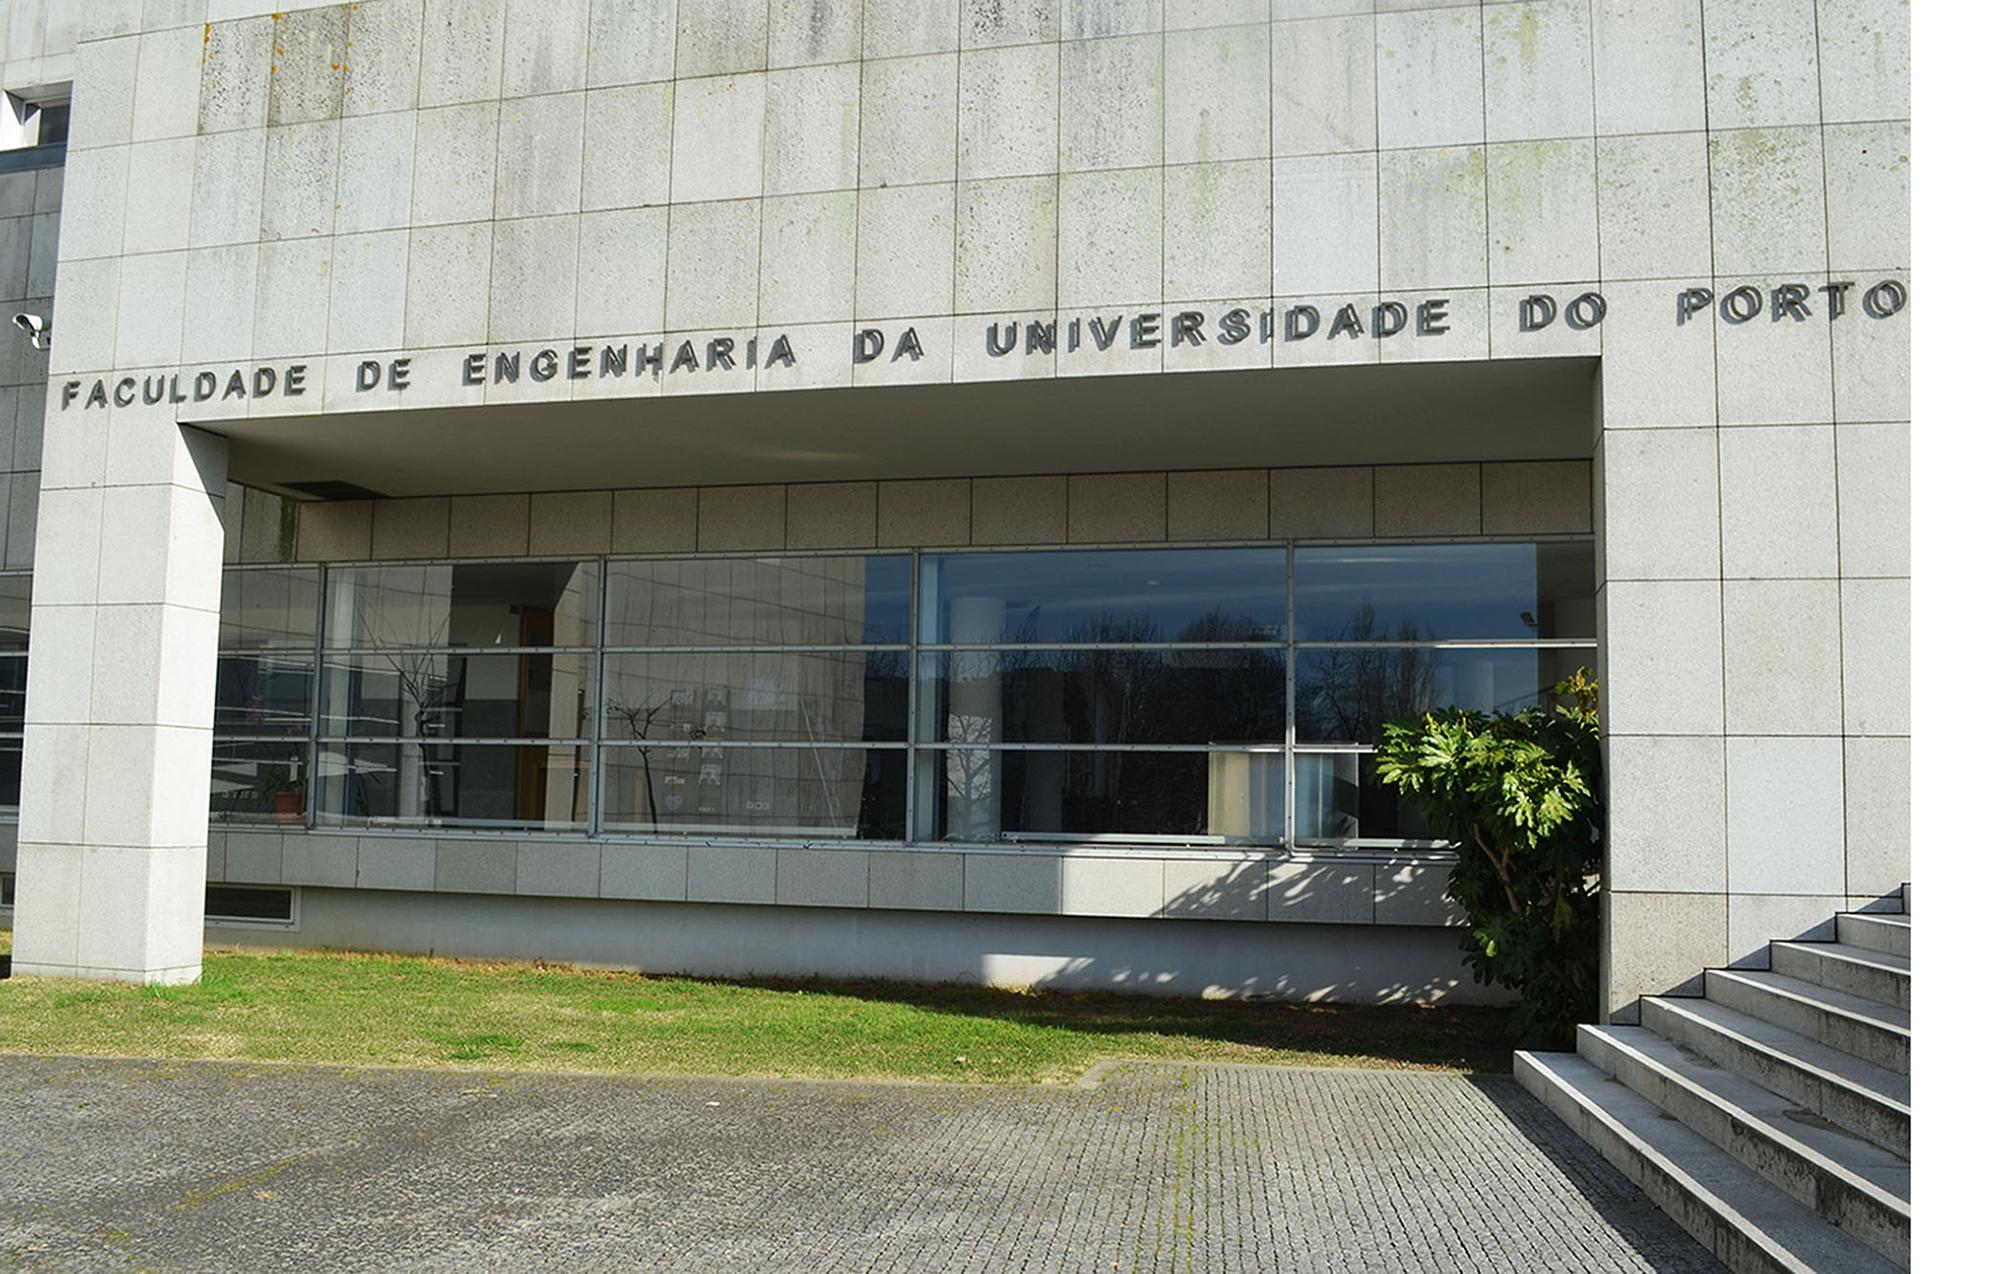 A FEUP é a primeira faculdade a receber a antena 5G por parte da Vodafone